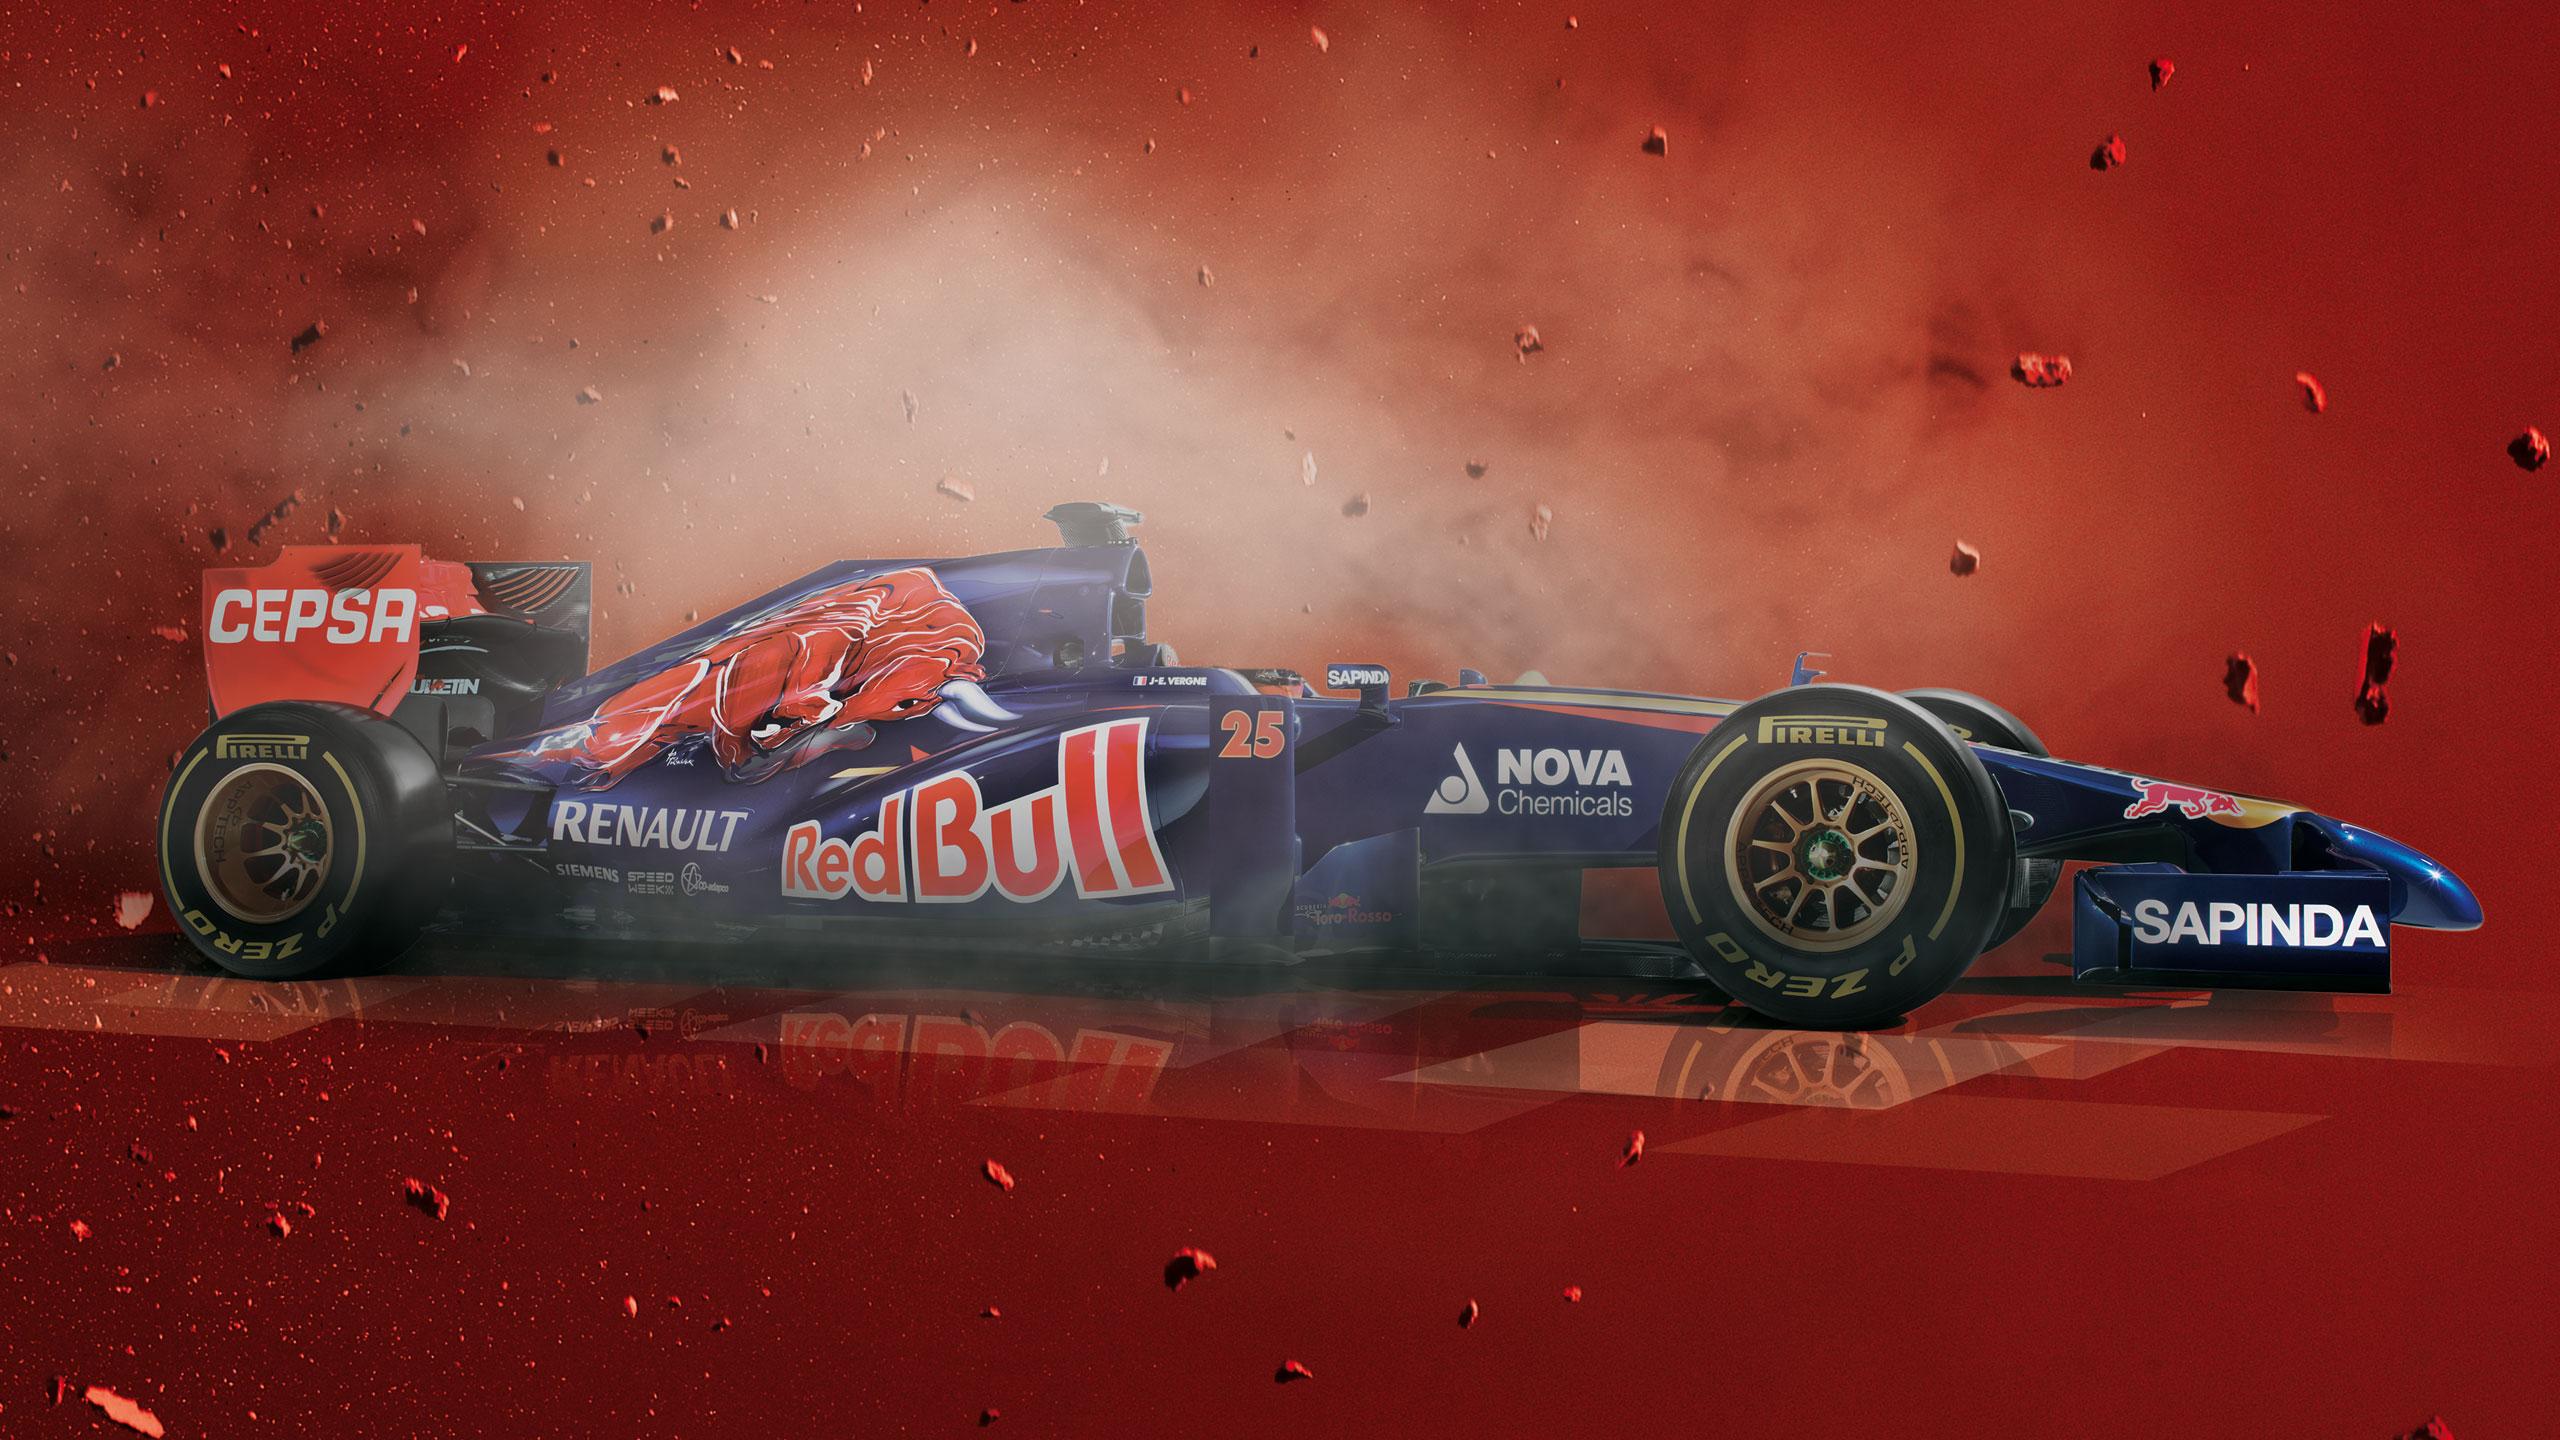 Formula 1. Presentacion Scuderia Toro Rosso. Cepsa. 2014.